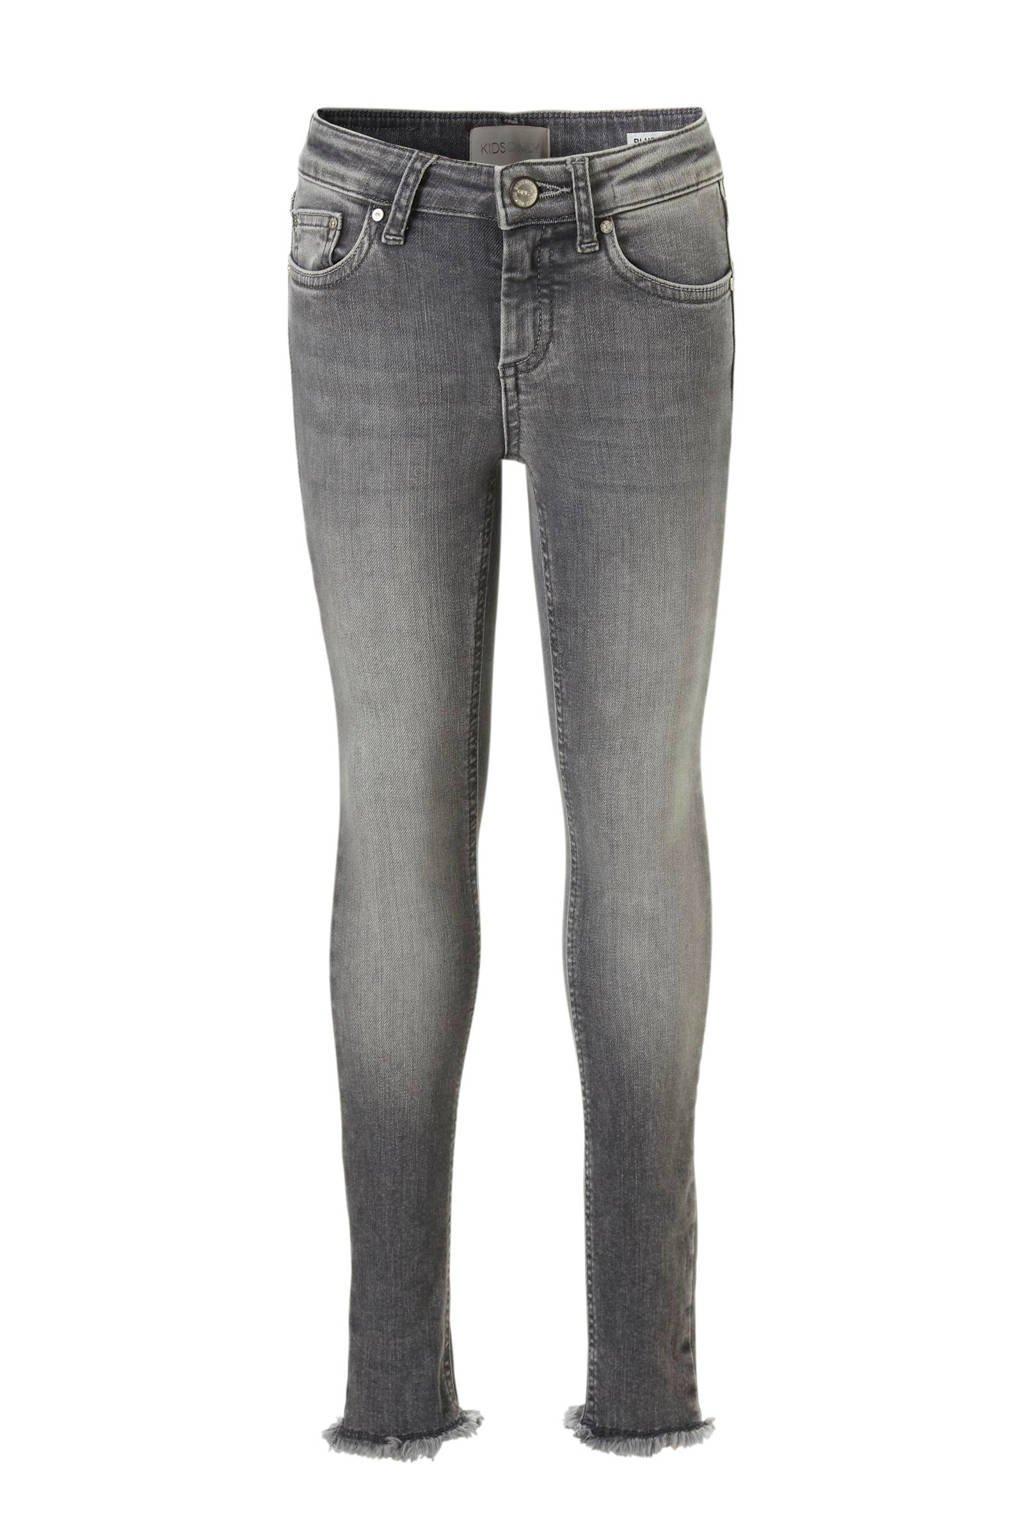 KIDS ONLY skinny jeans grijs, Grijs